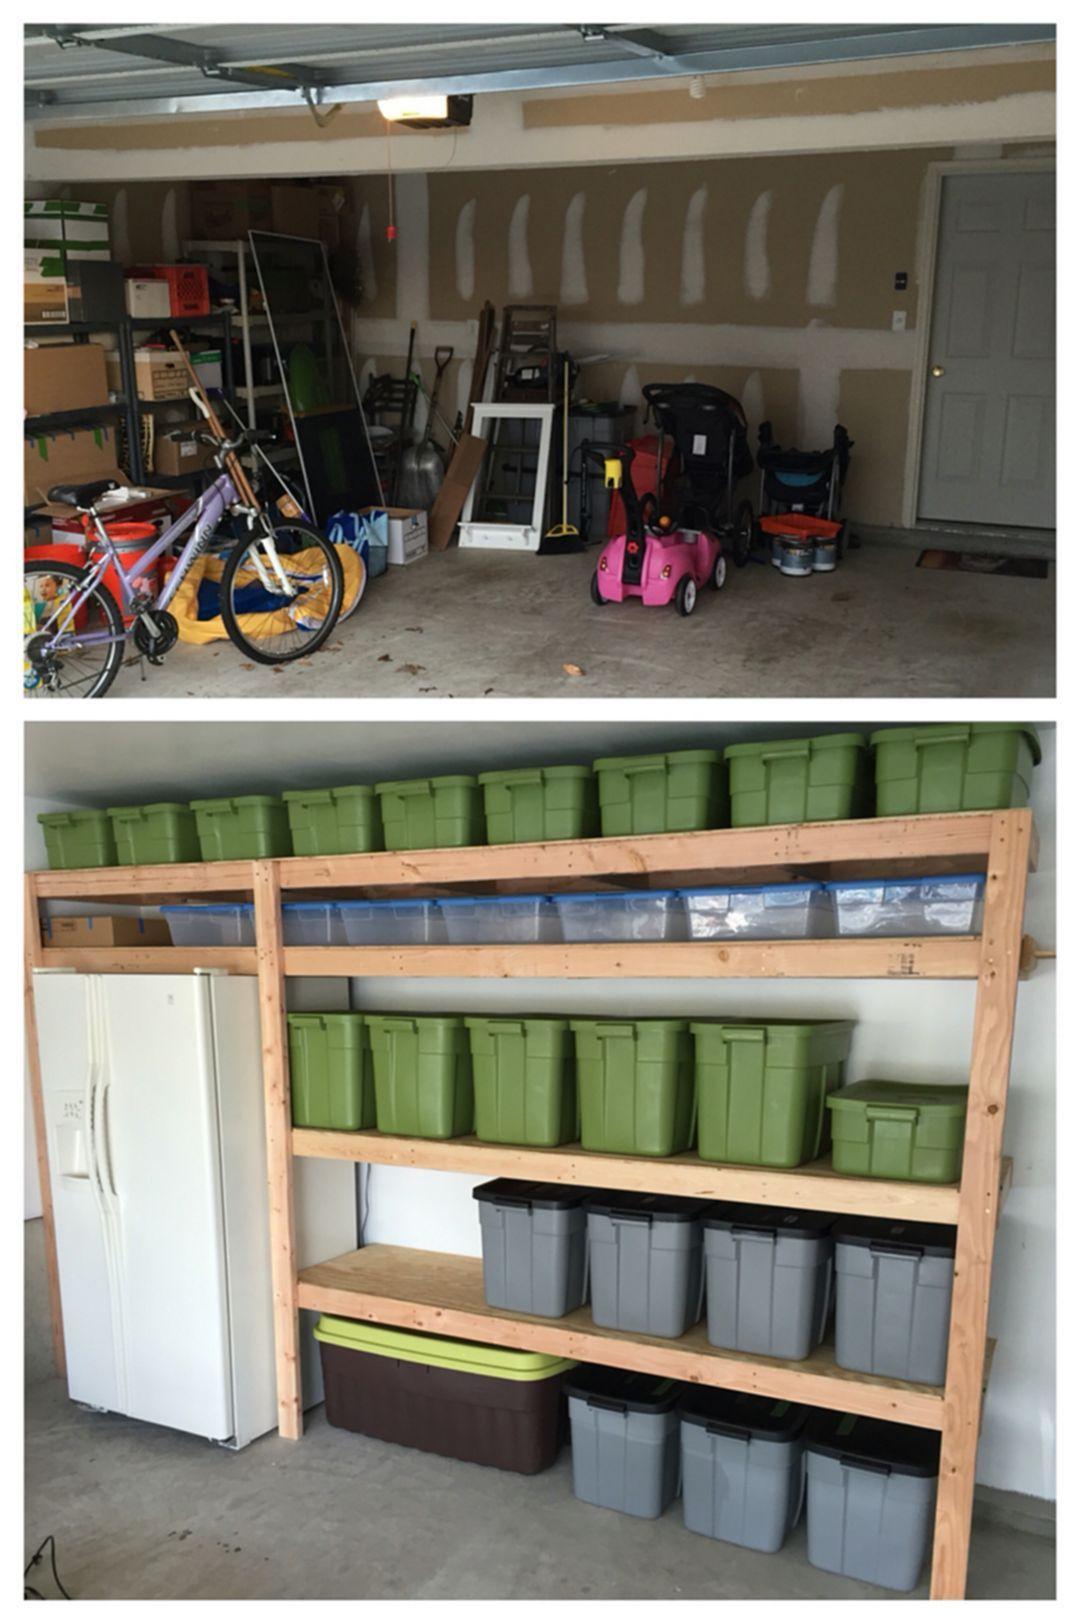 Brilliant garage organizations and storage ideas diy